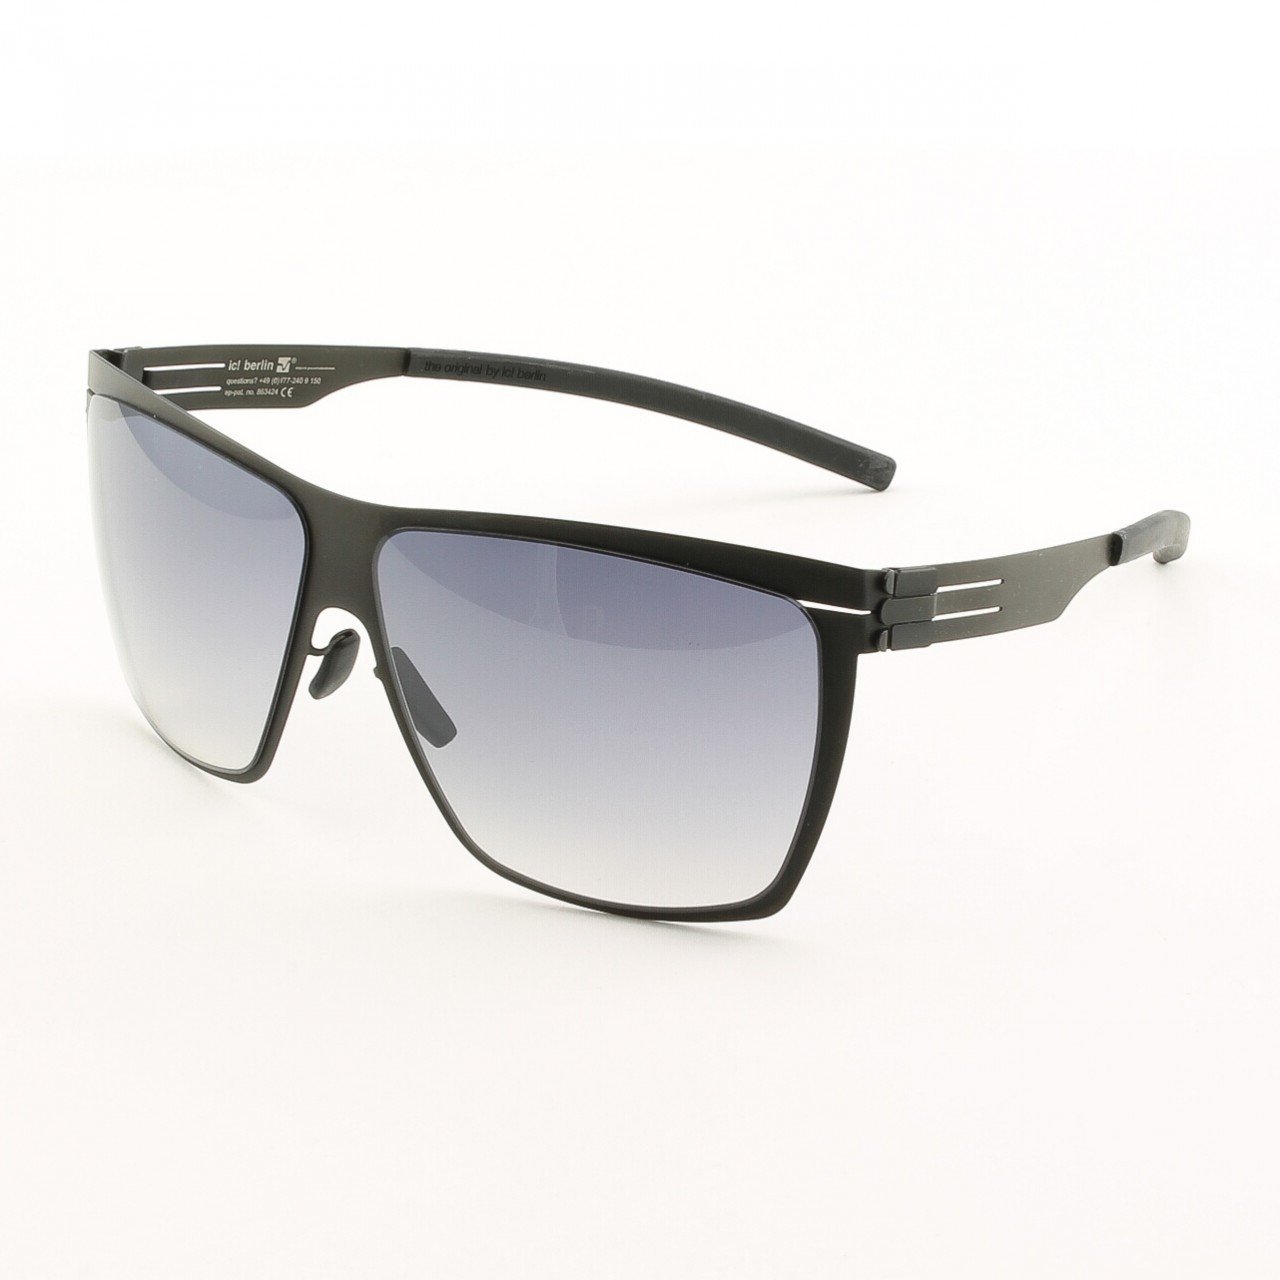 ic! Berlin Dark Energy Sunglasses Col. Black with Black Gradient Lenses